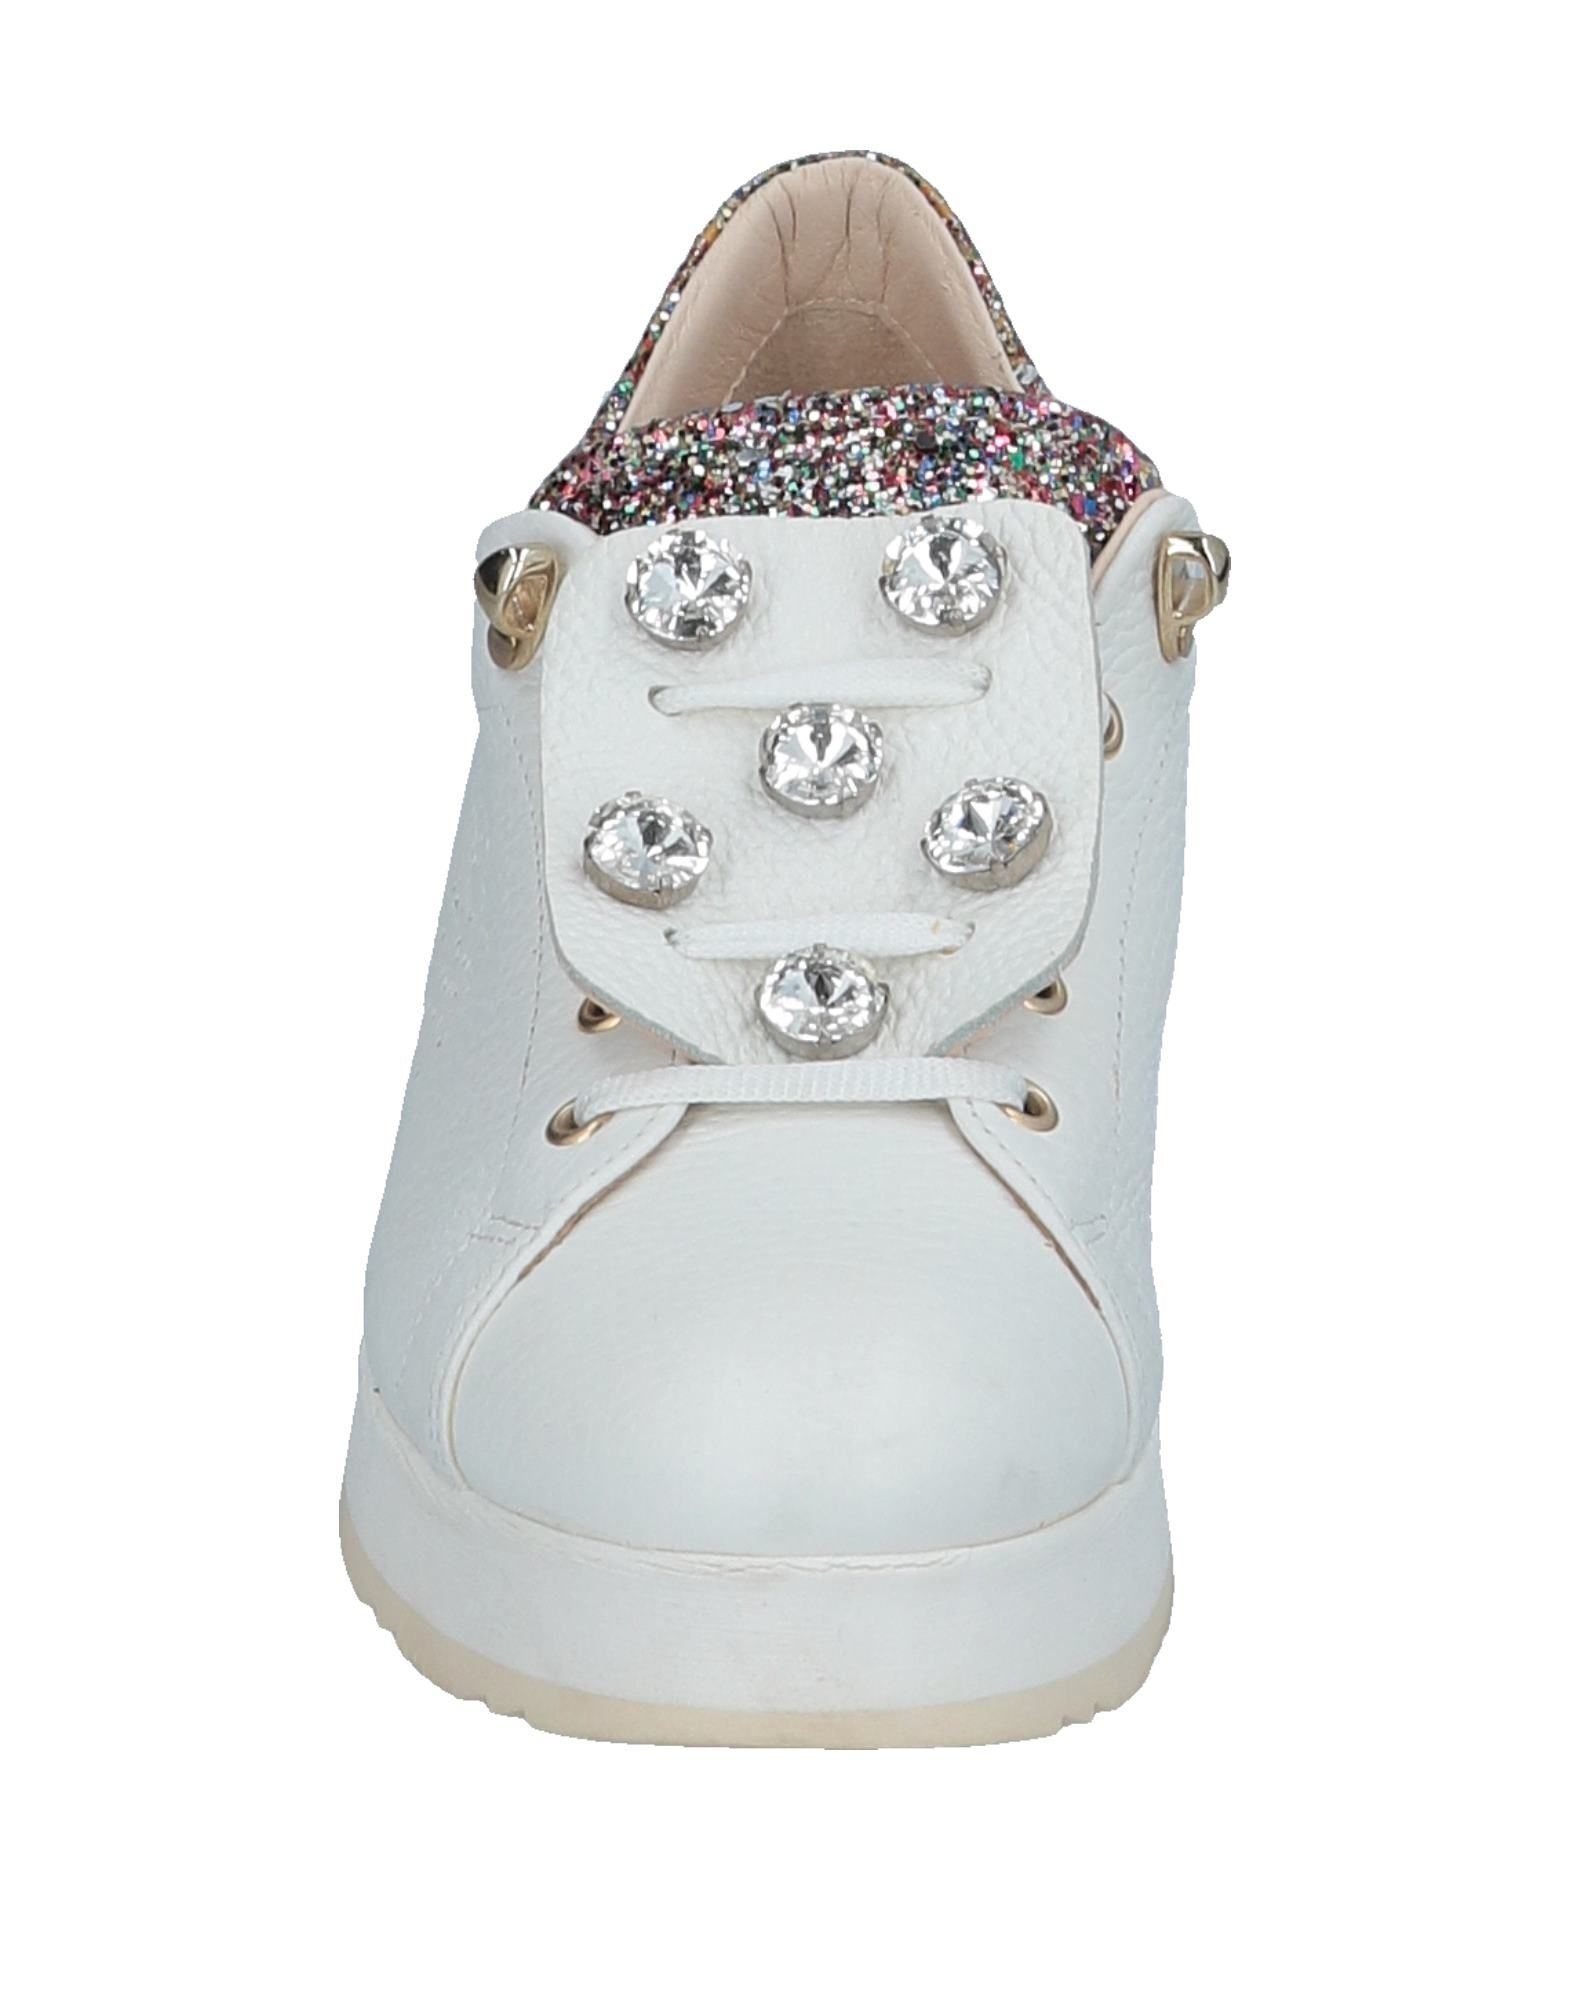 Lm 11515645TR Sneakers Damen  11515645TR Lm Gute Qualität beliebte Schuhe c016f8